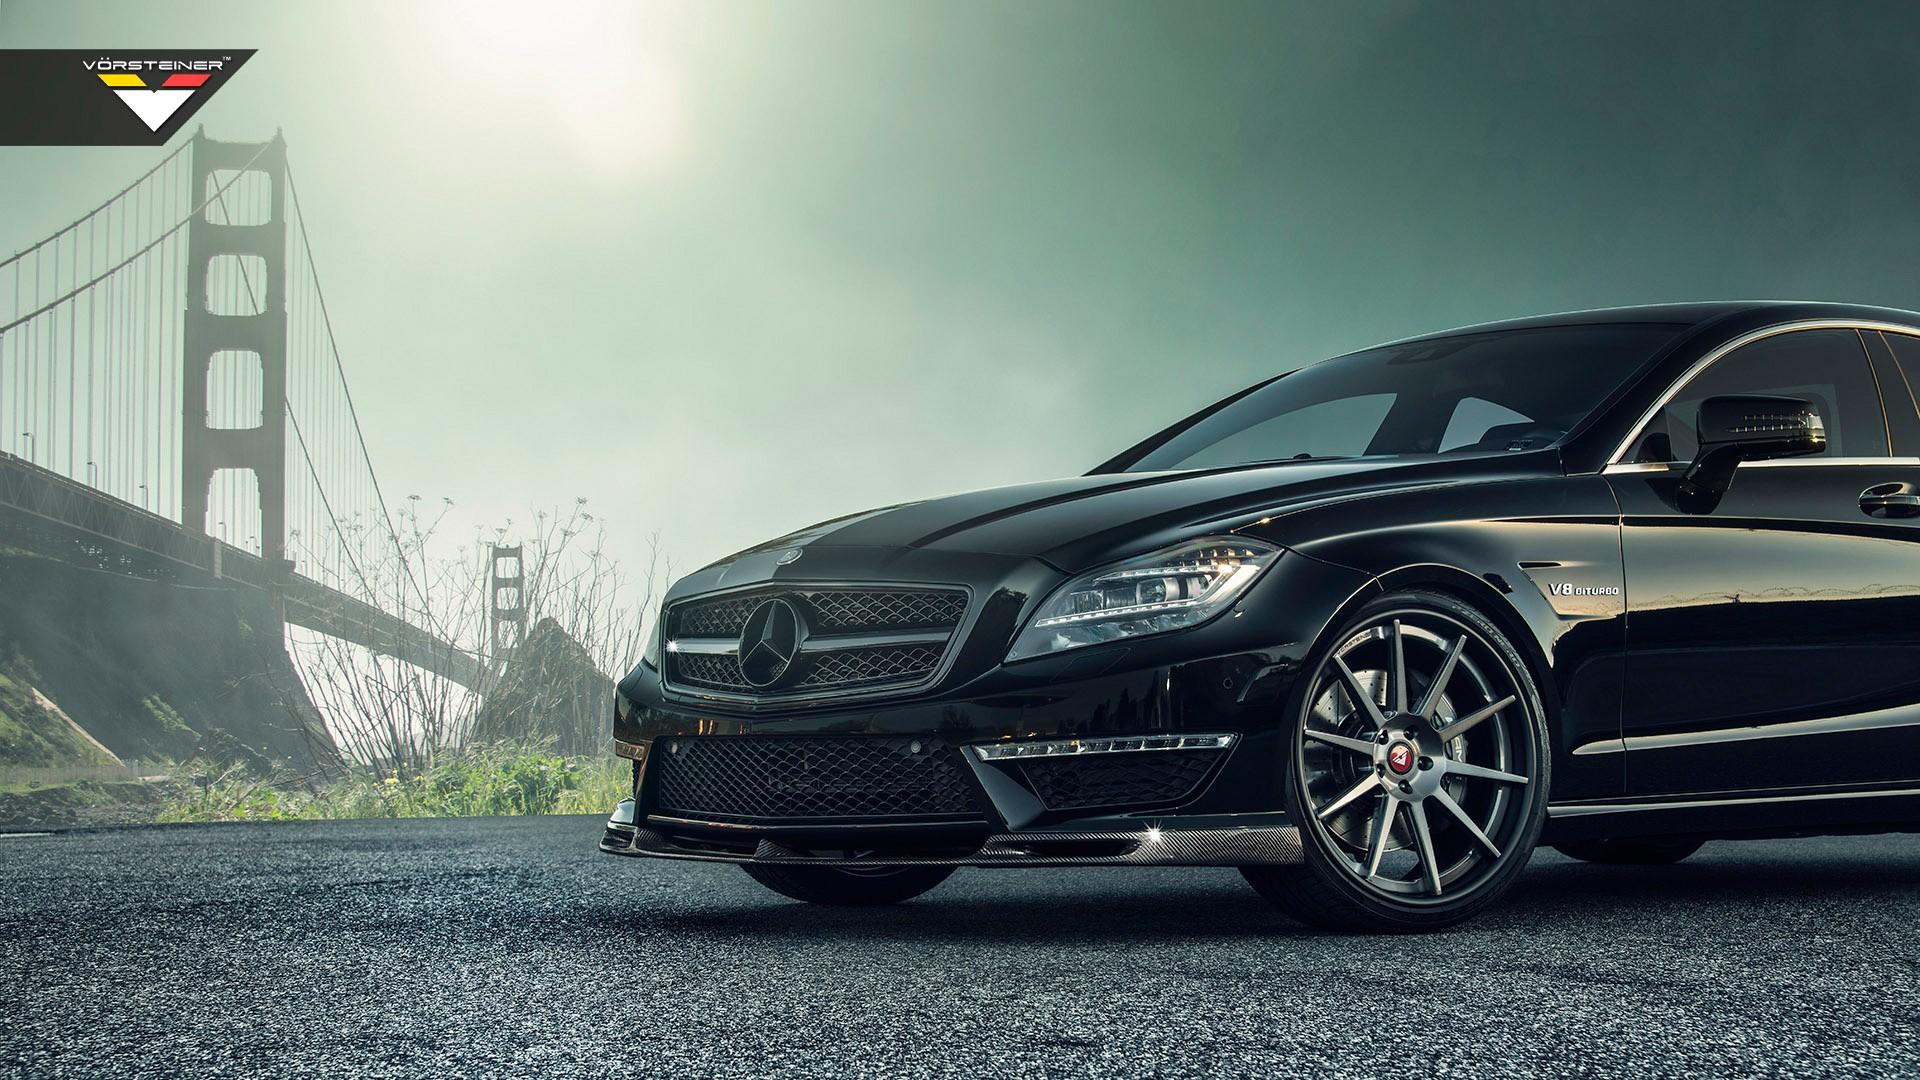 Vorsteiner mercedes benz cls63 amg 2 wallpaper hd car for Mercedes benz cls63